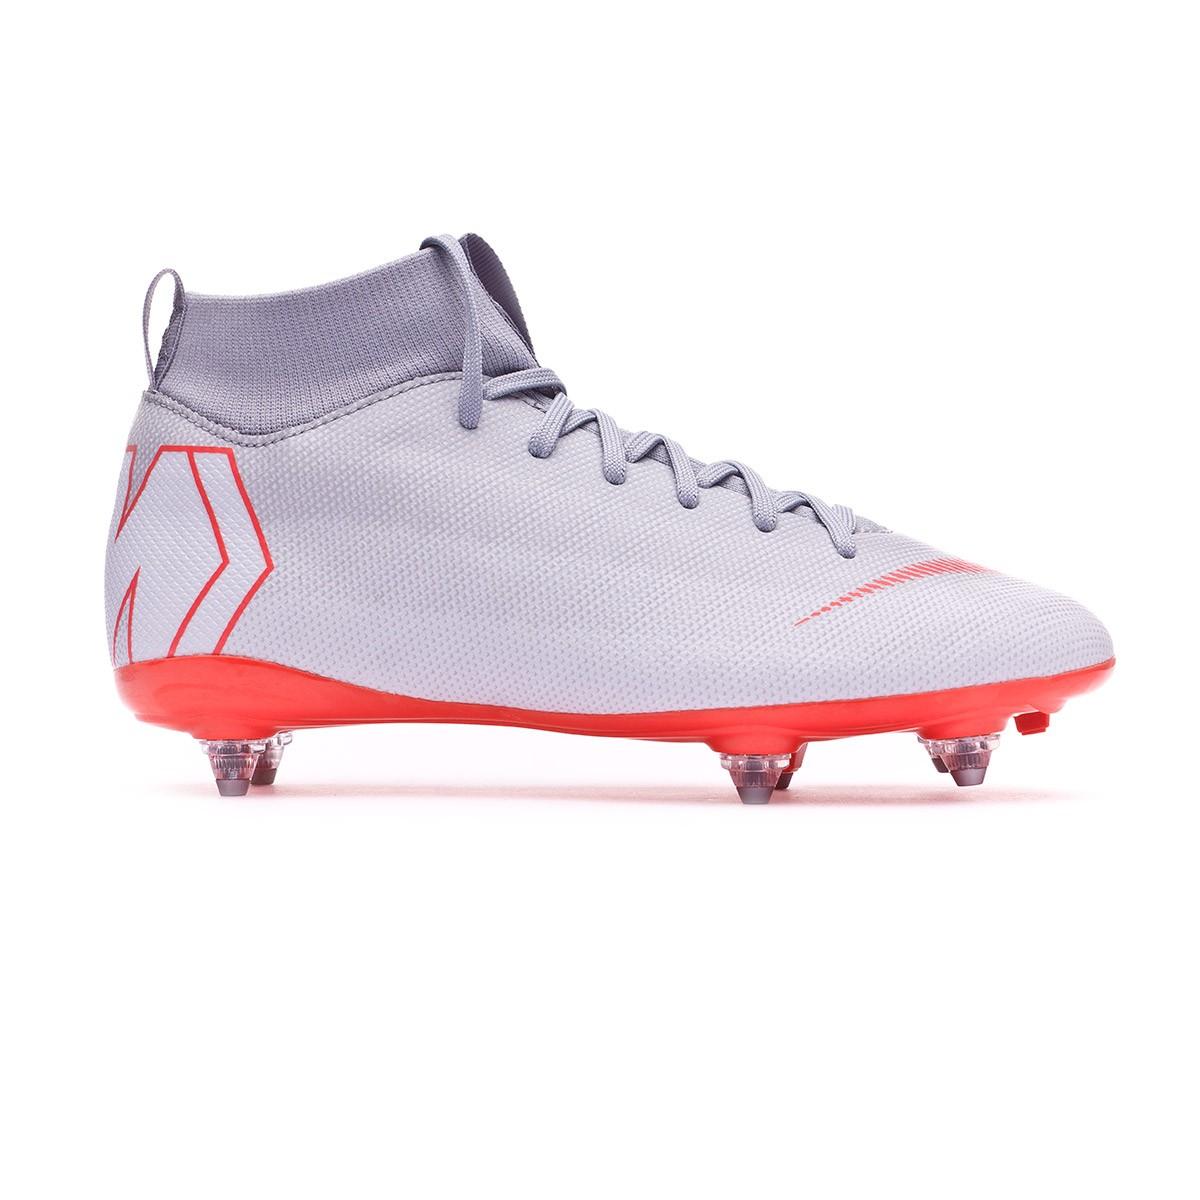 f88d3aed6 Football Boots Nike Kids Mercurial Superfly VI Academy SG-Pro Wolf  grey-Light crimson-Pure platinum - Tienda de fútbol Fútbol Emotion